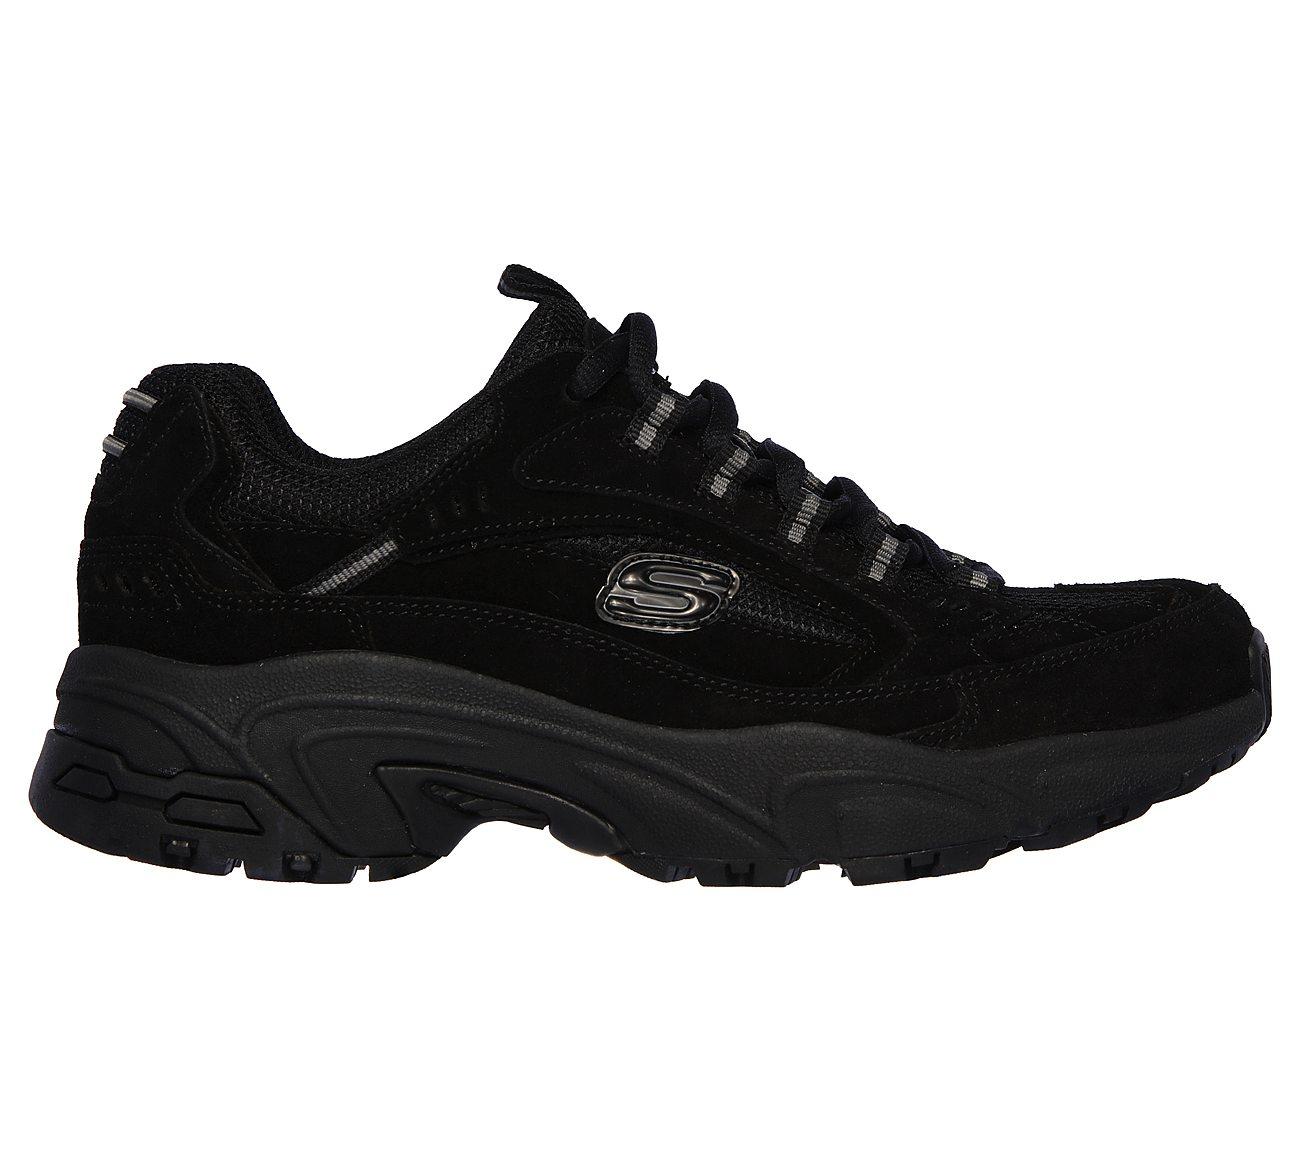 Skechers Black Athletic Sneakers with Perforations Sneakers | Bata